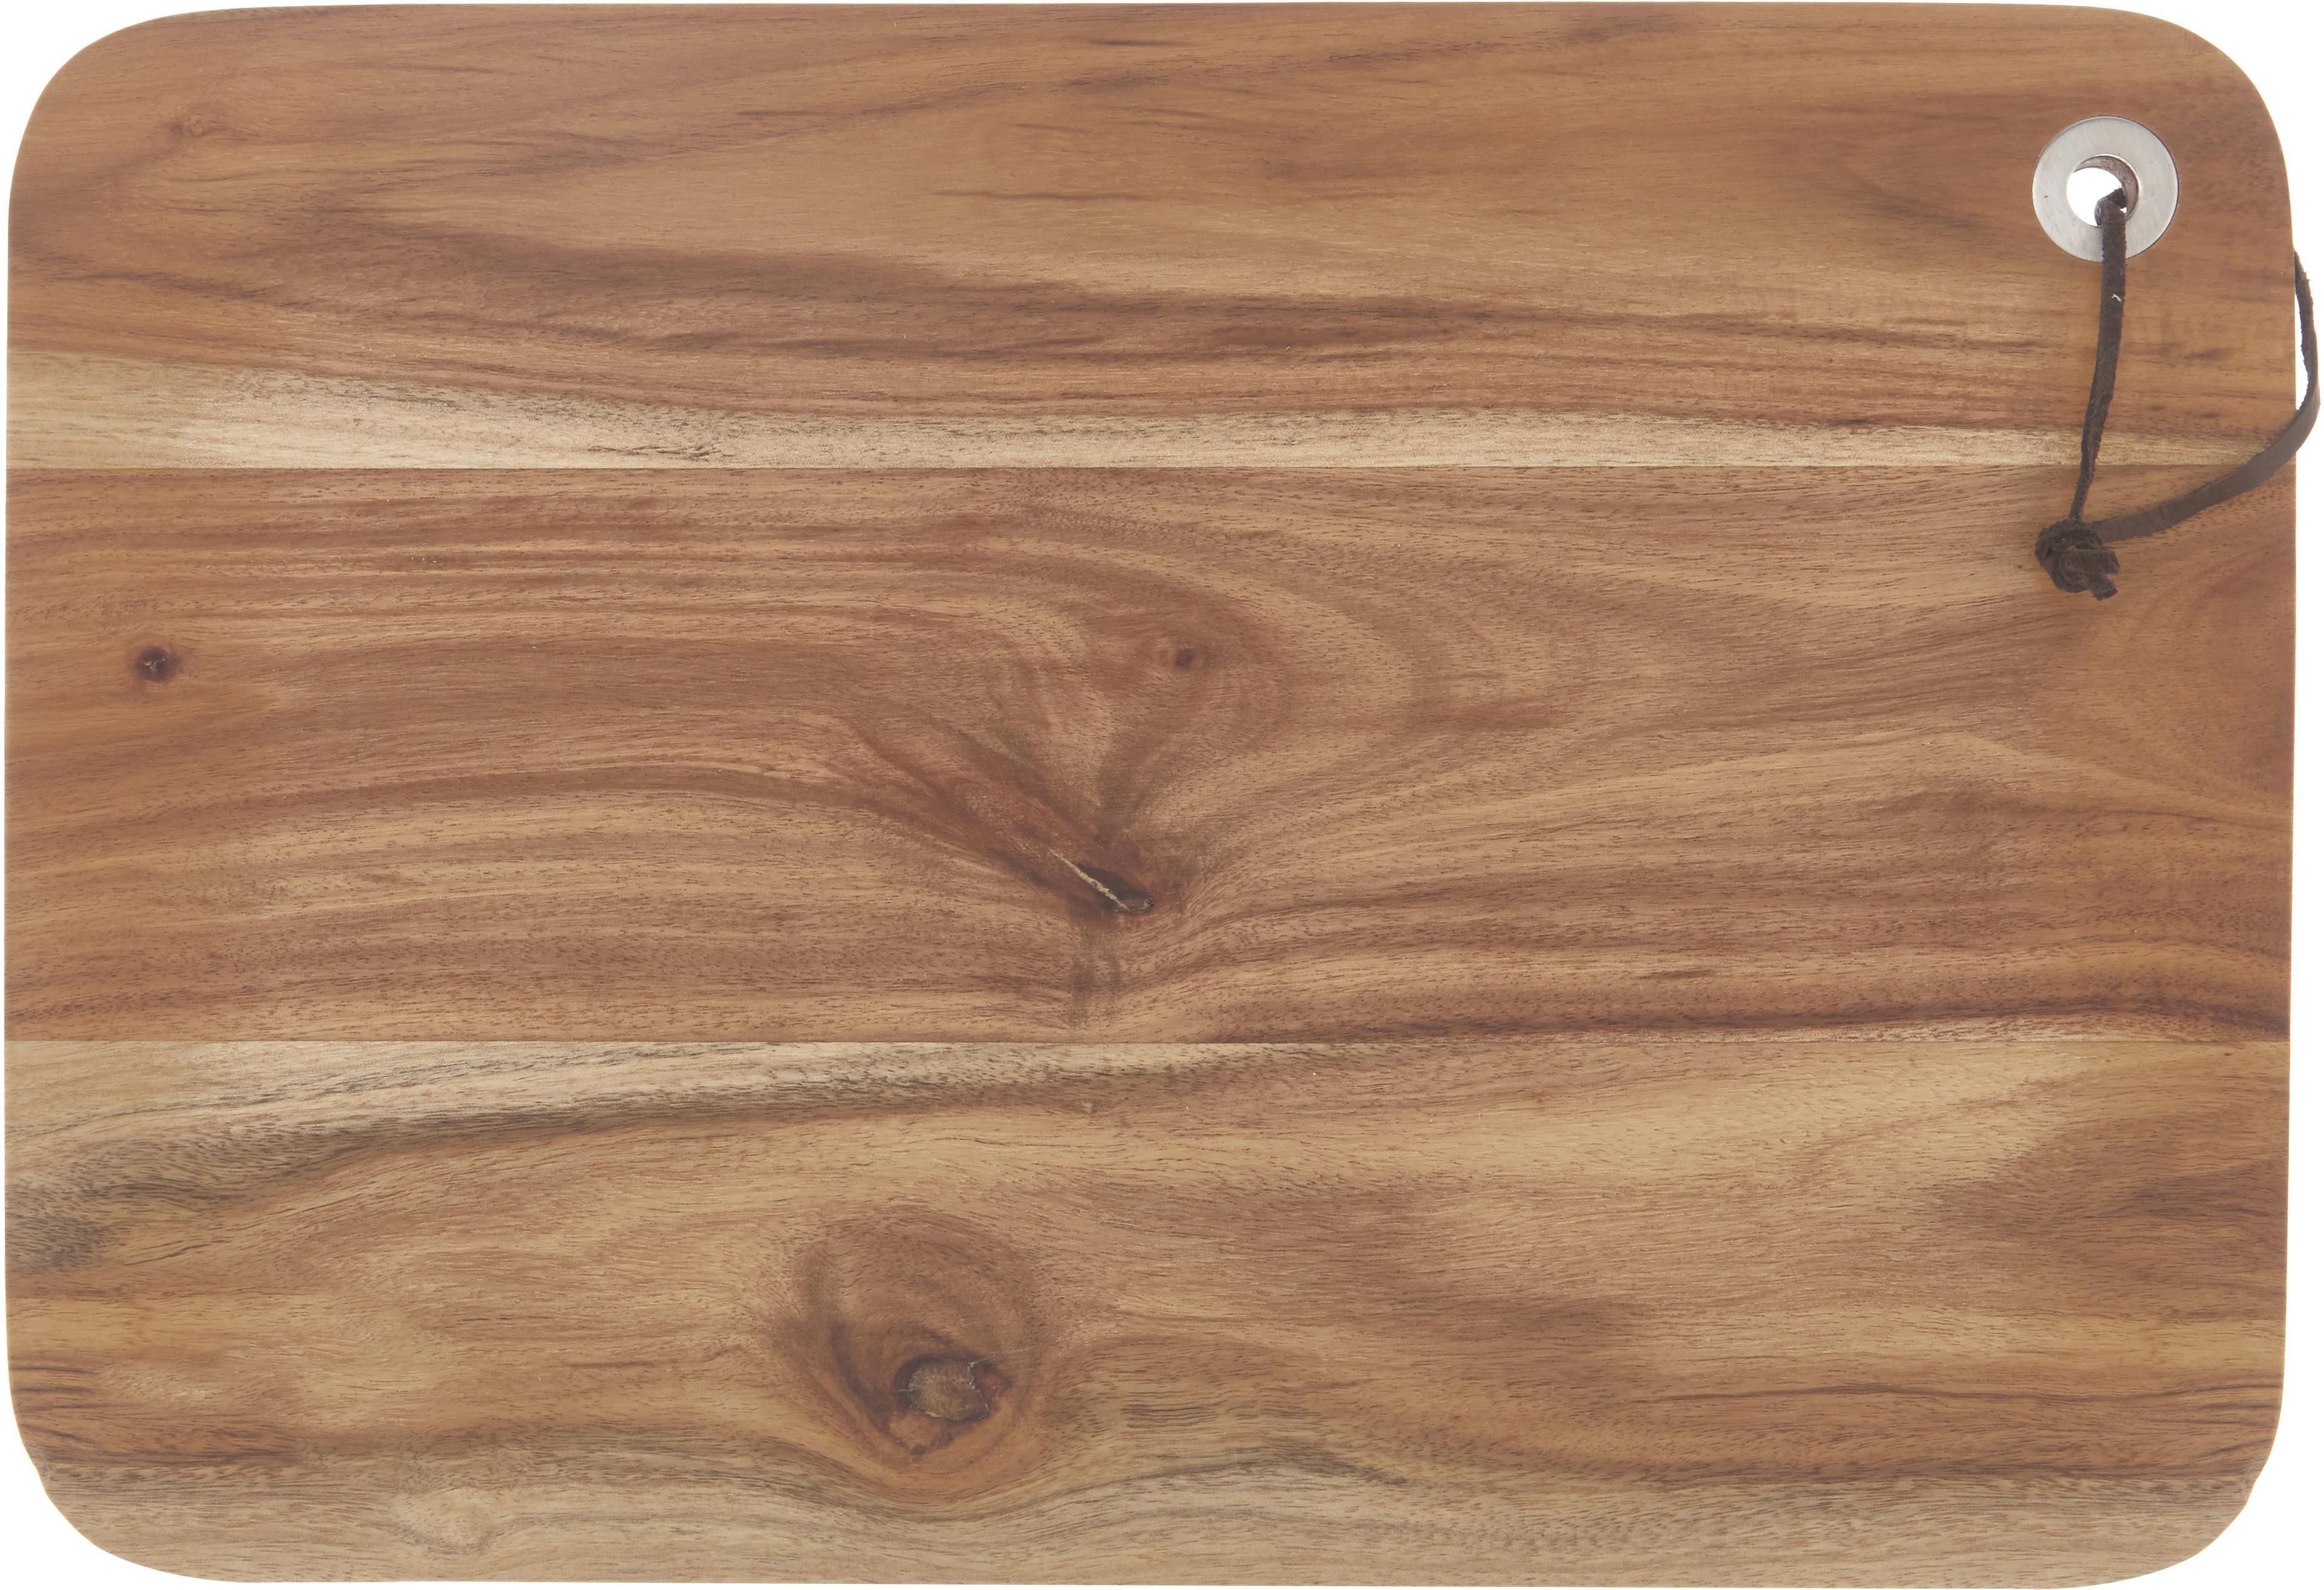 Schneidebrett Acacia, Akazienholz, Akazienholz, B 33 x T 23 cm